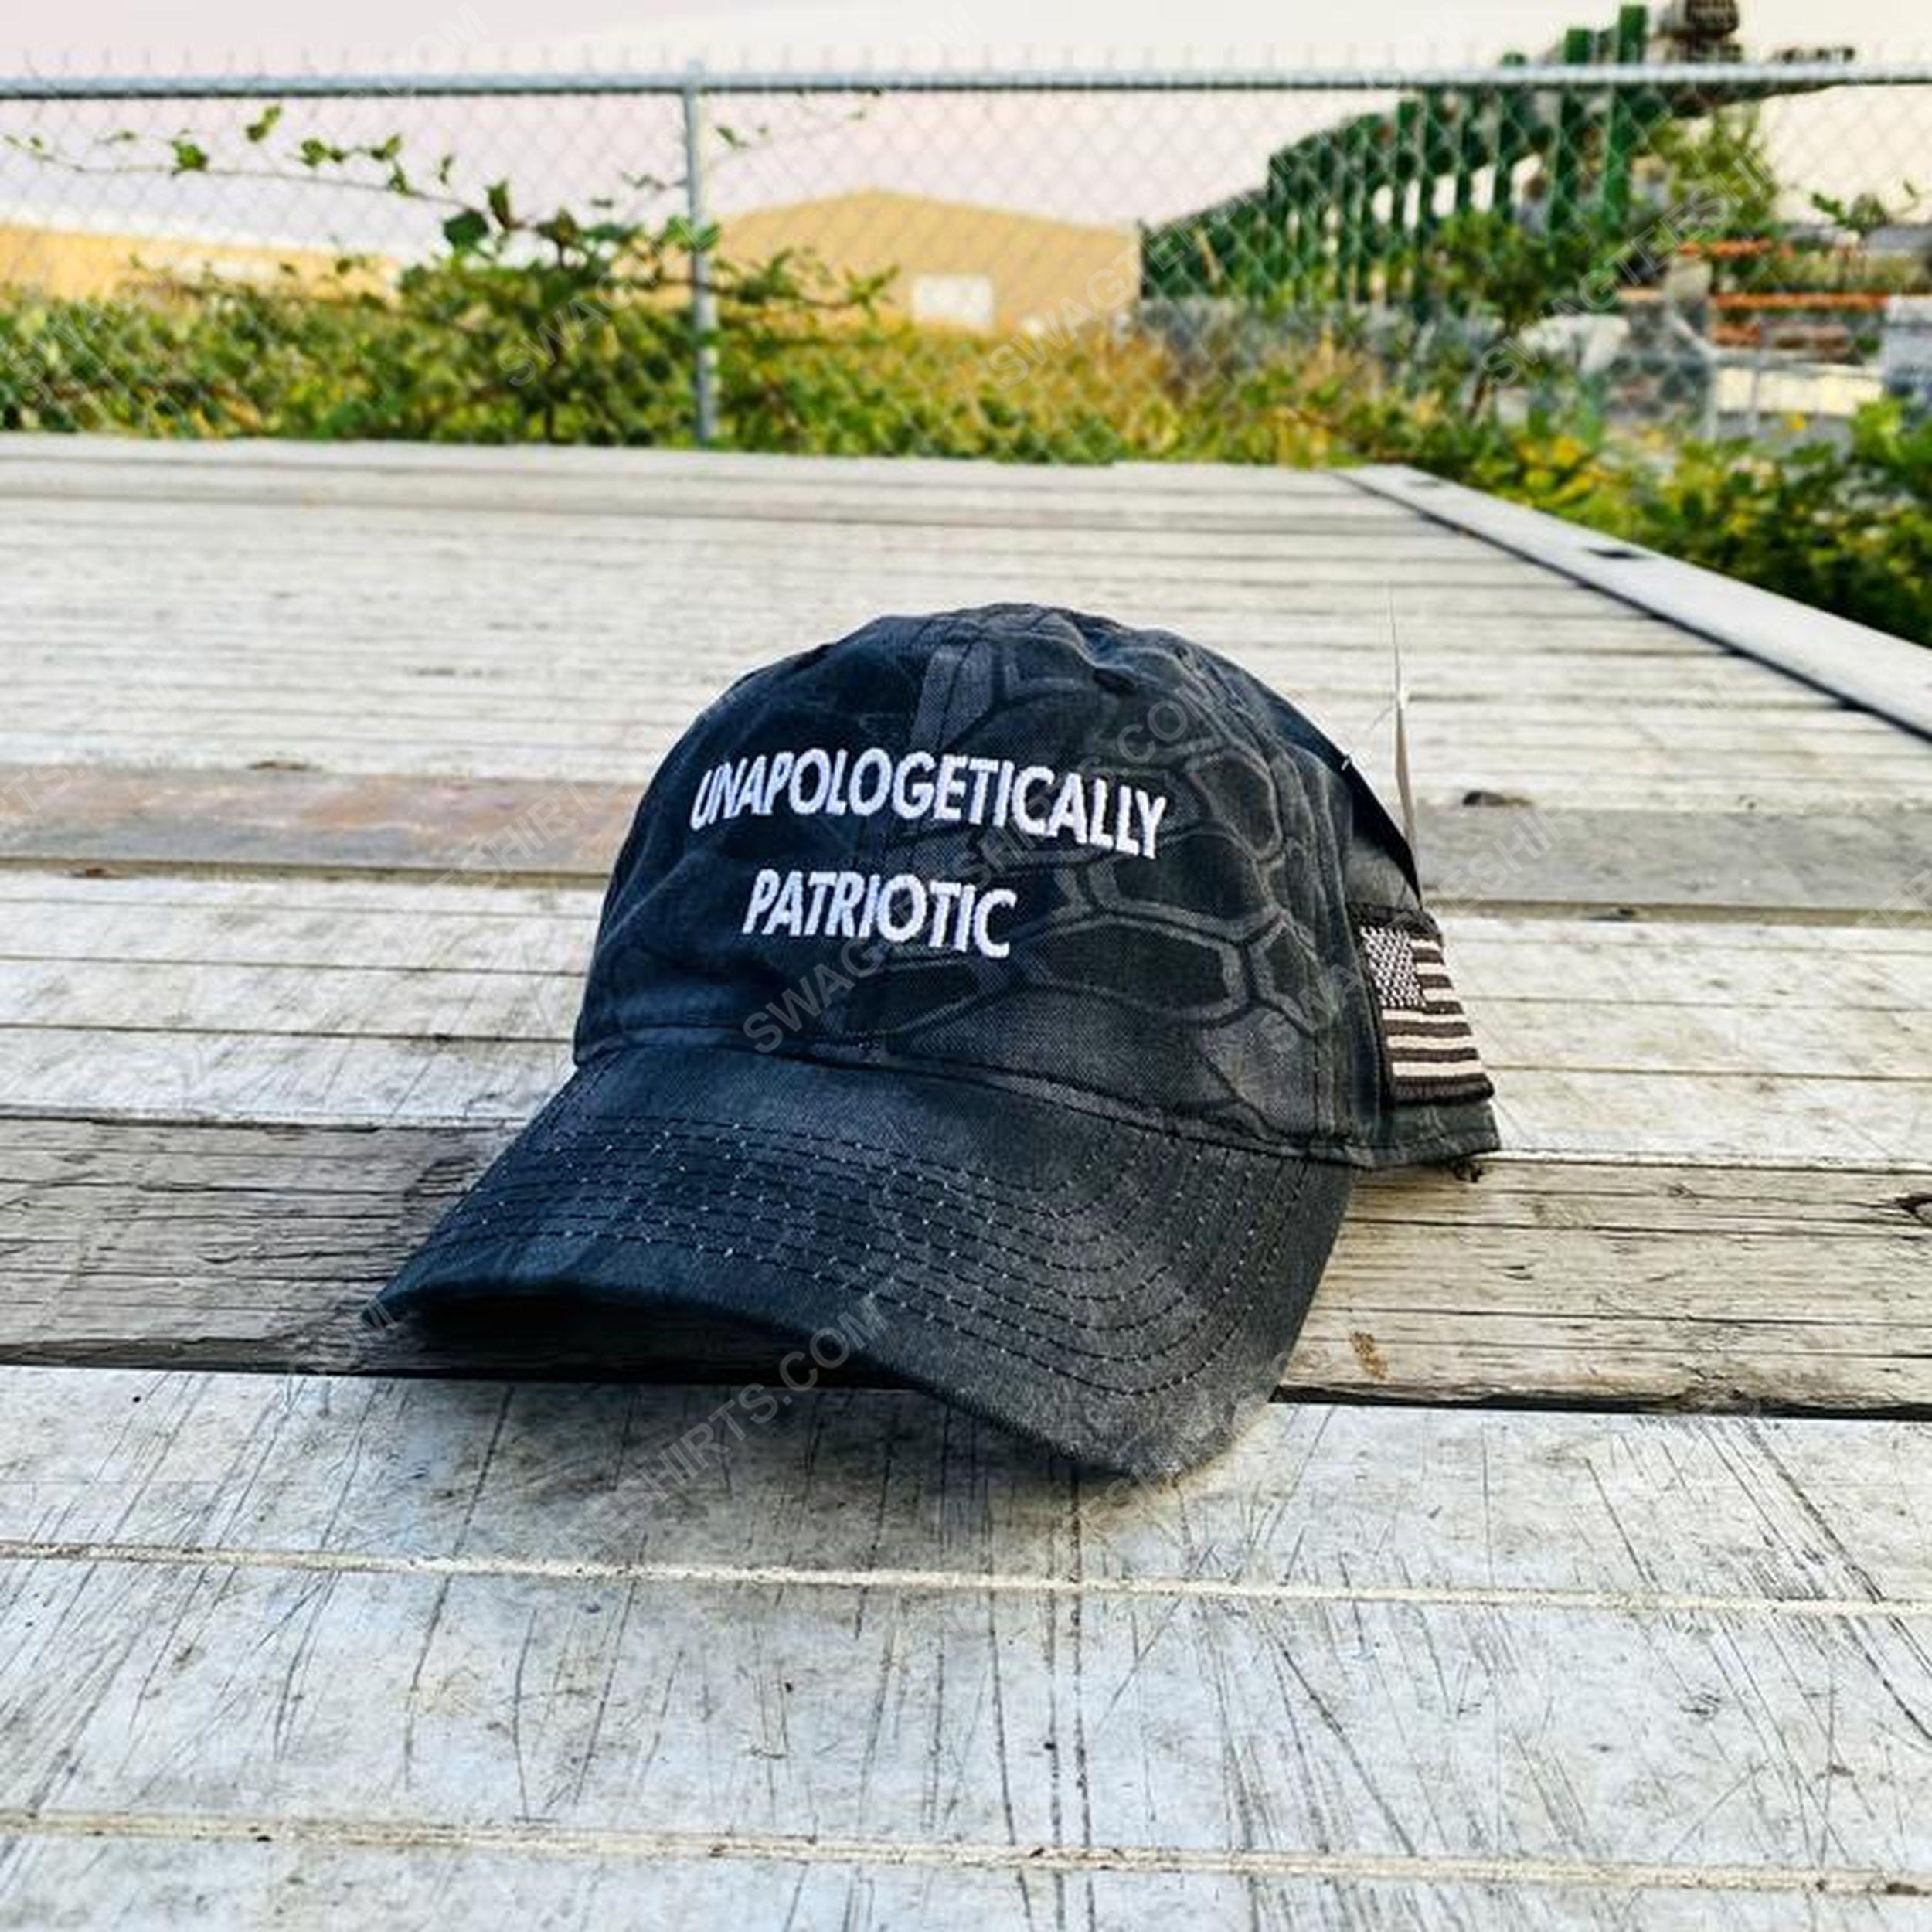 Unapologetically patriotic full print classic hat 1 - Copy